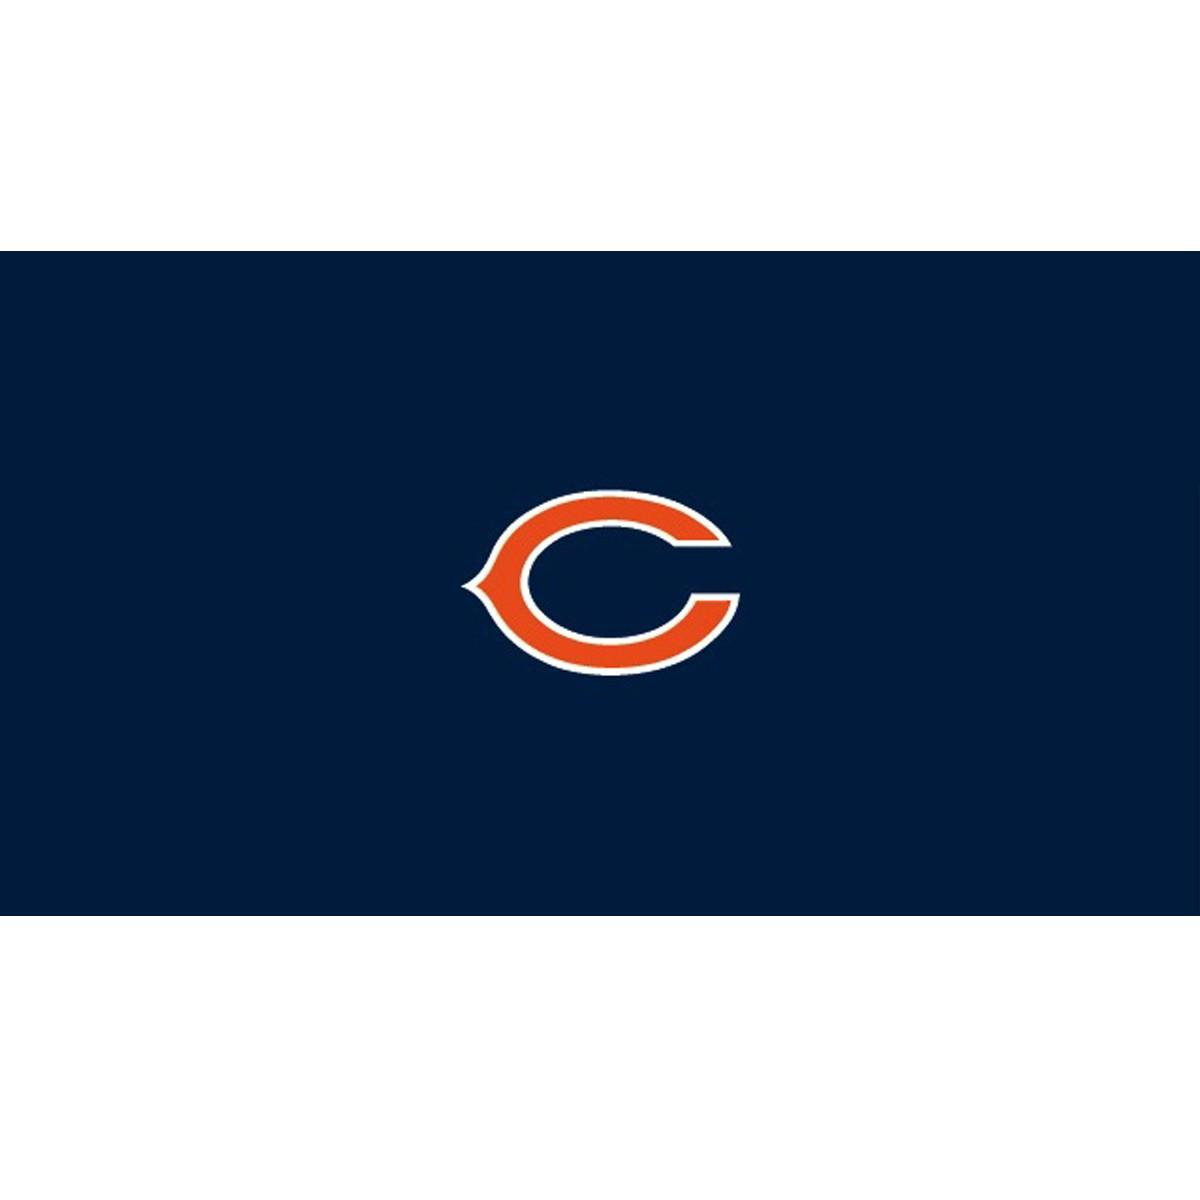 CHICAGO BEARS 8-FOOT BILLIARD CLOTH